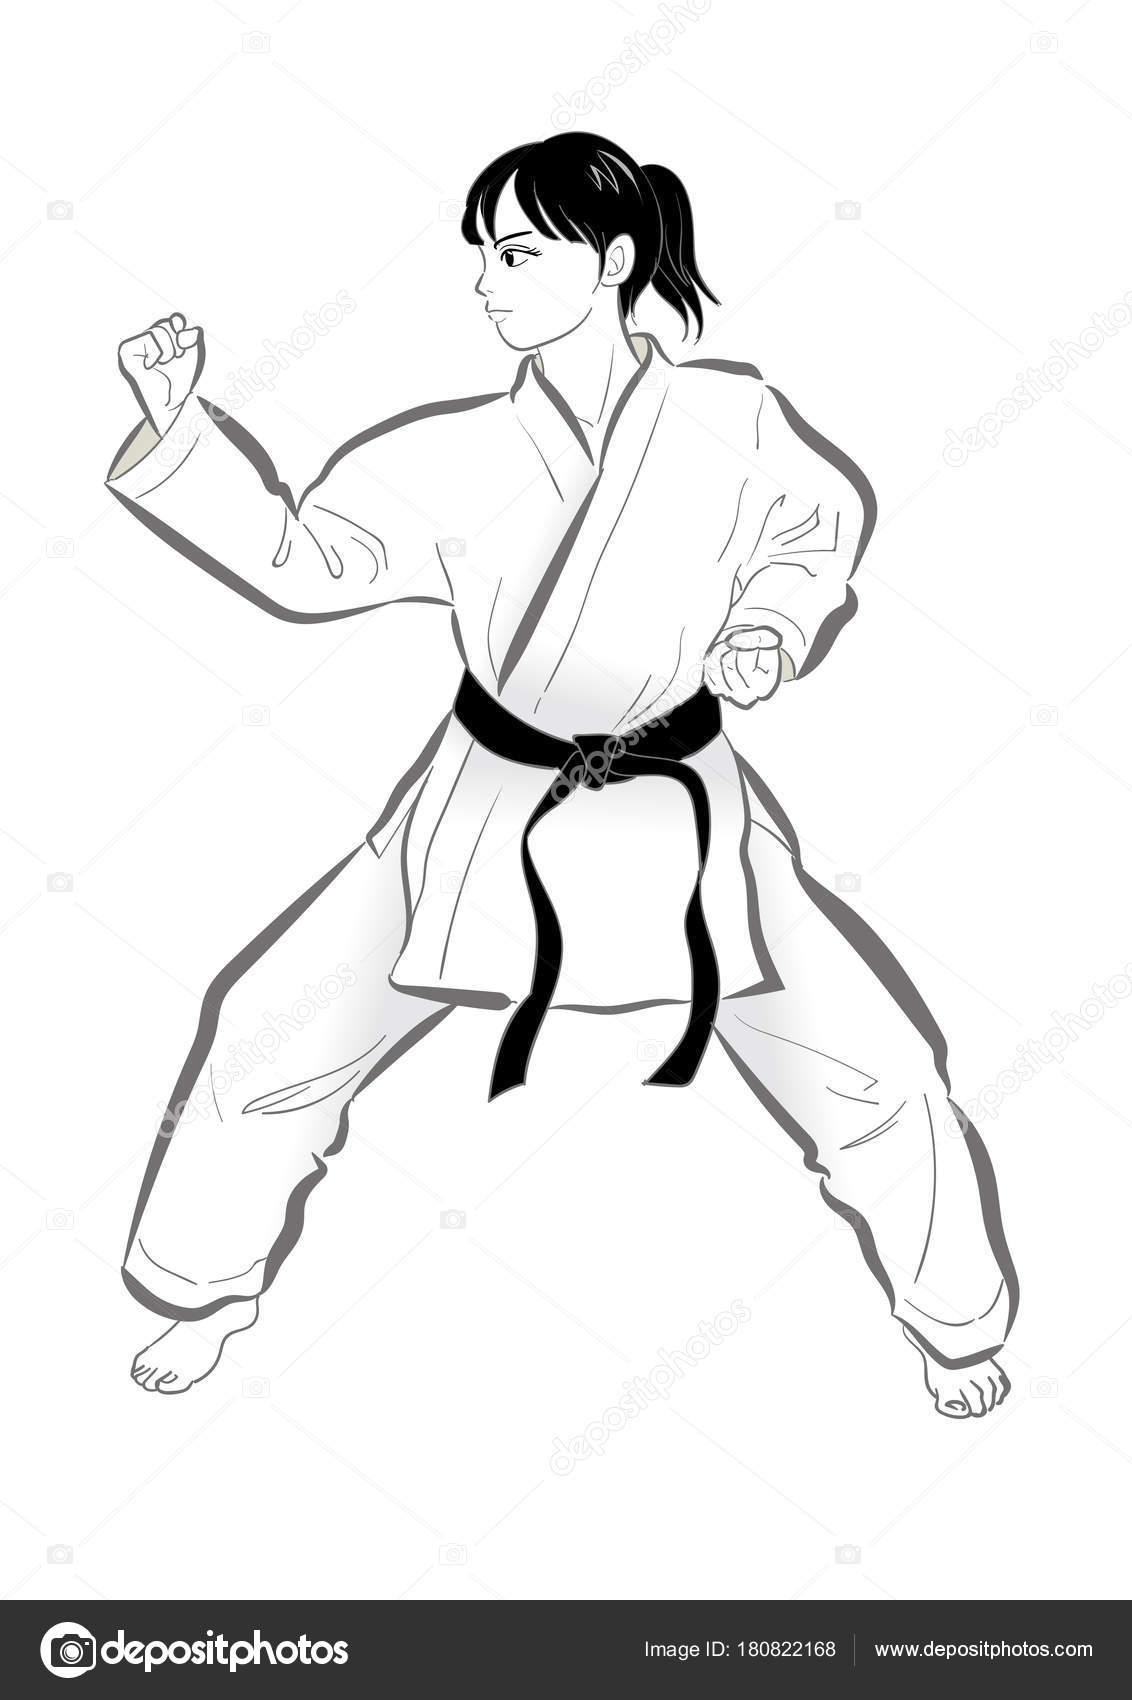 Karate Pose Vector Material Japanese Culture